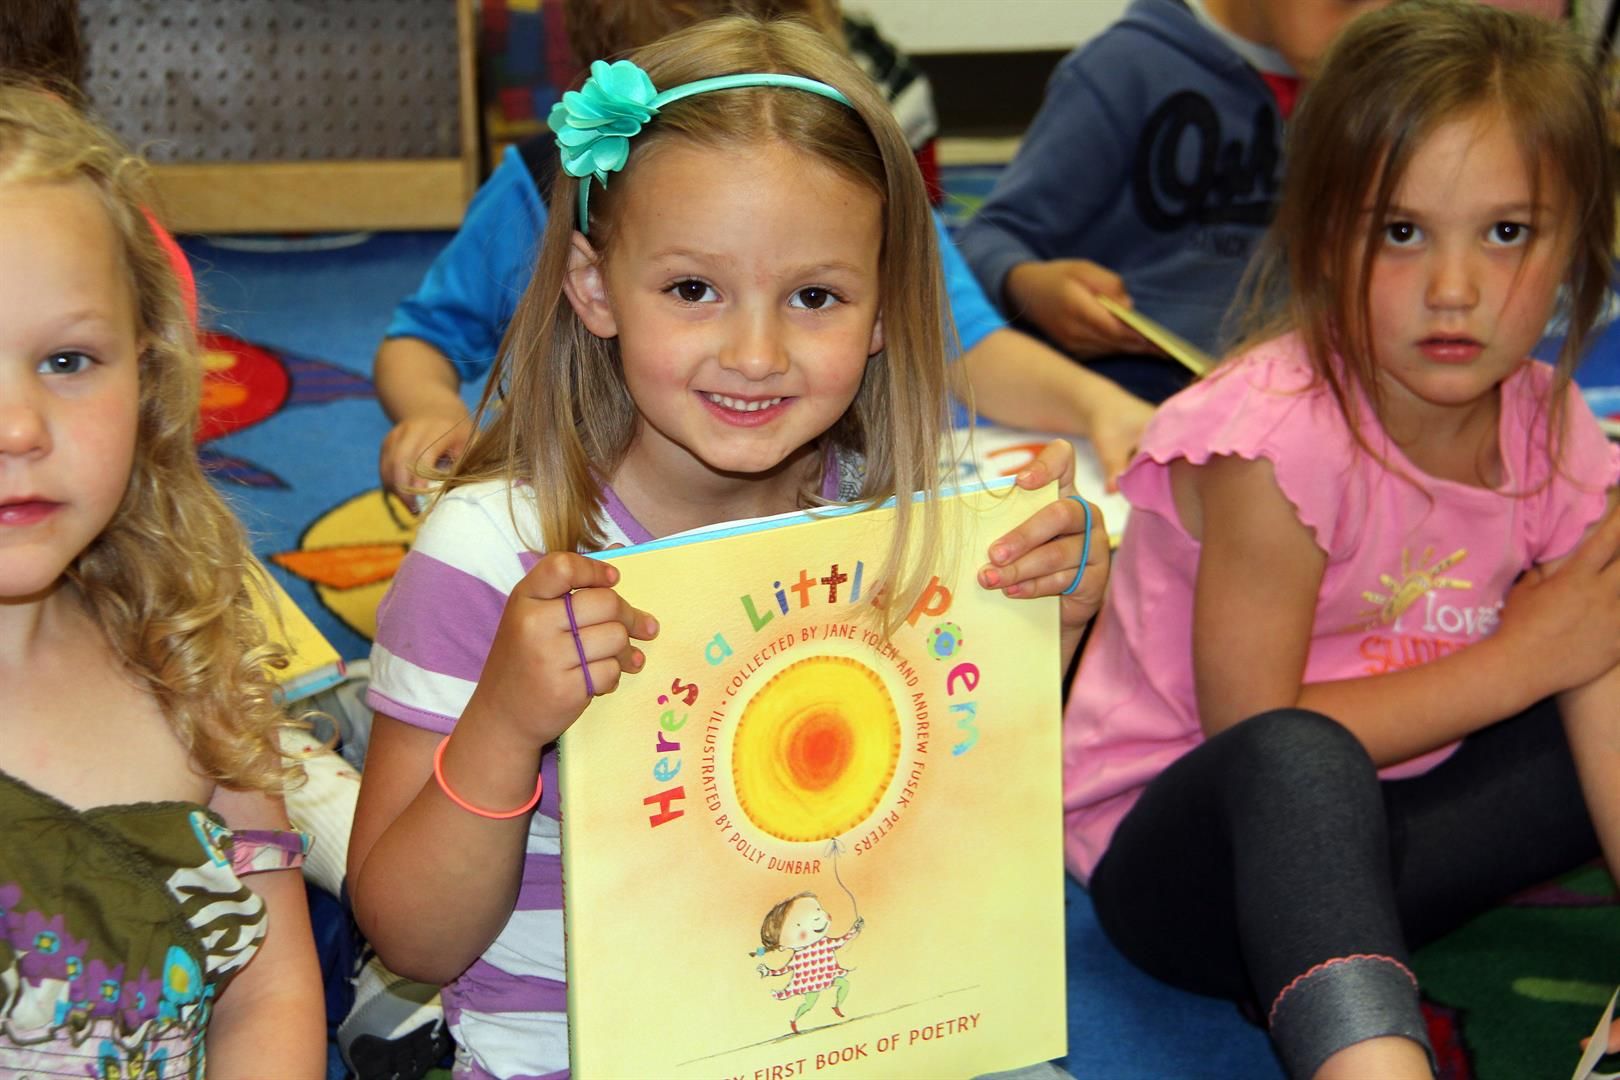 girls smiling holding book